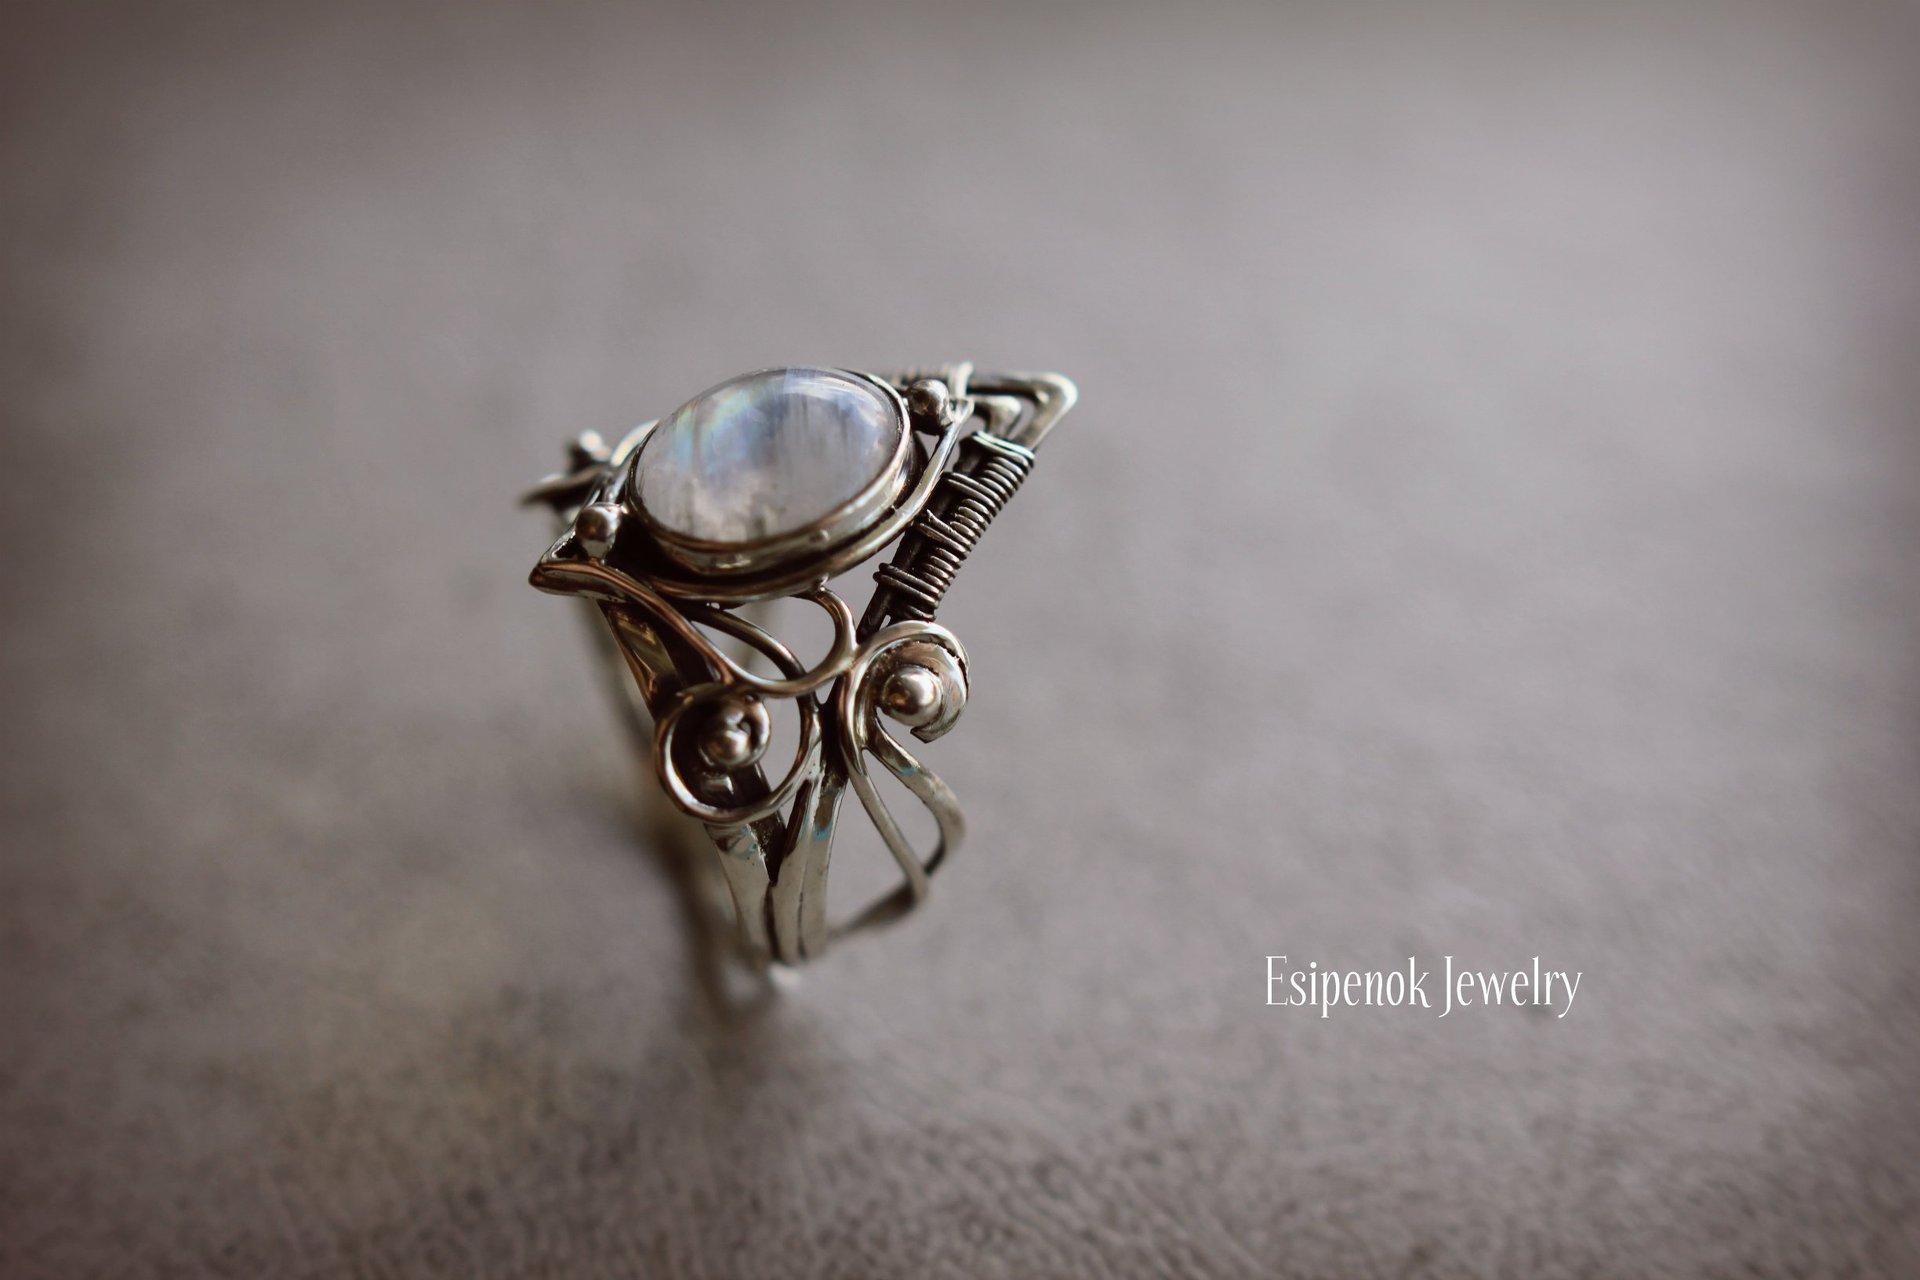 Vintage Tibetan moonstone Big Healing Crystal Rings For Women Boho Antique Indian Moonstone Ring Fine Jewelry Girls Ladies Gifts